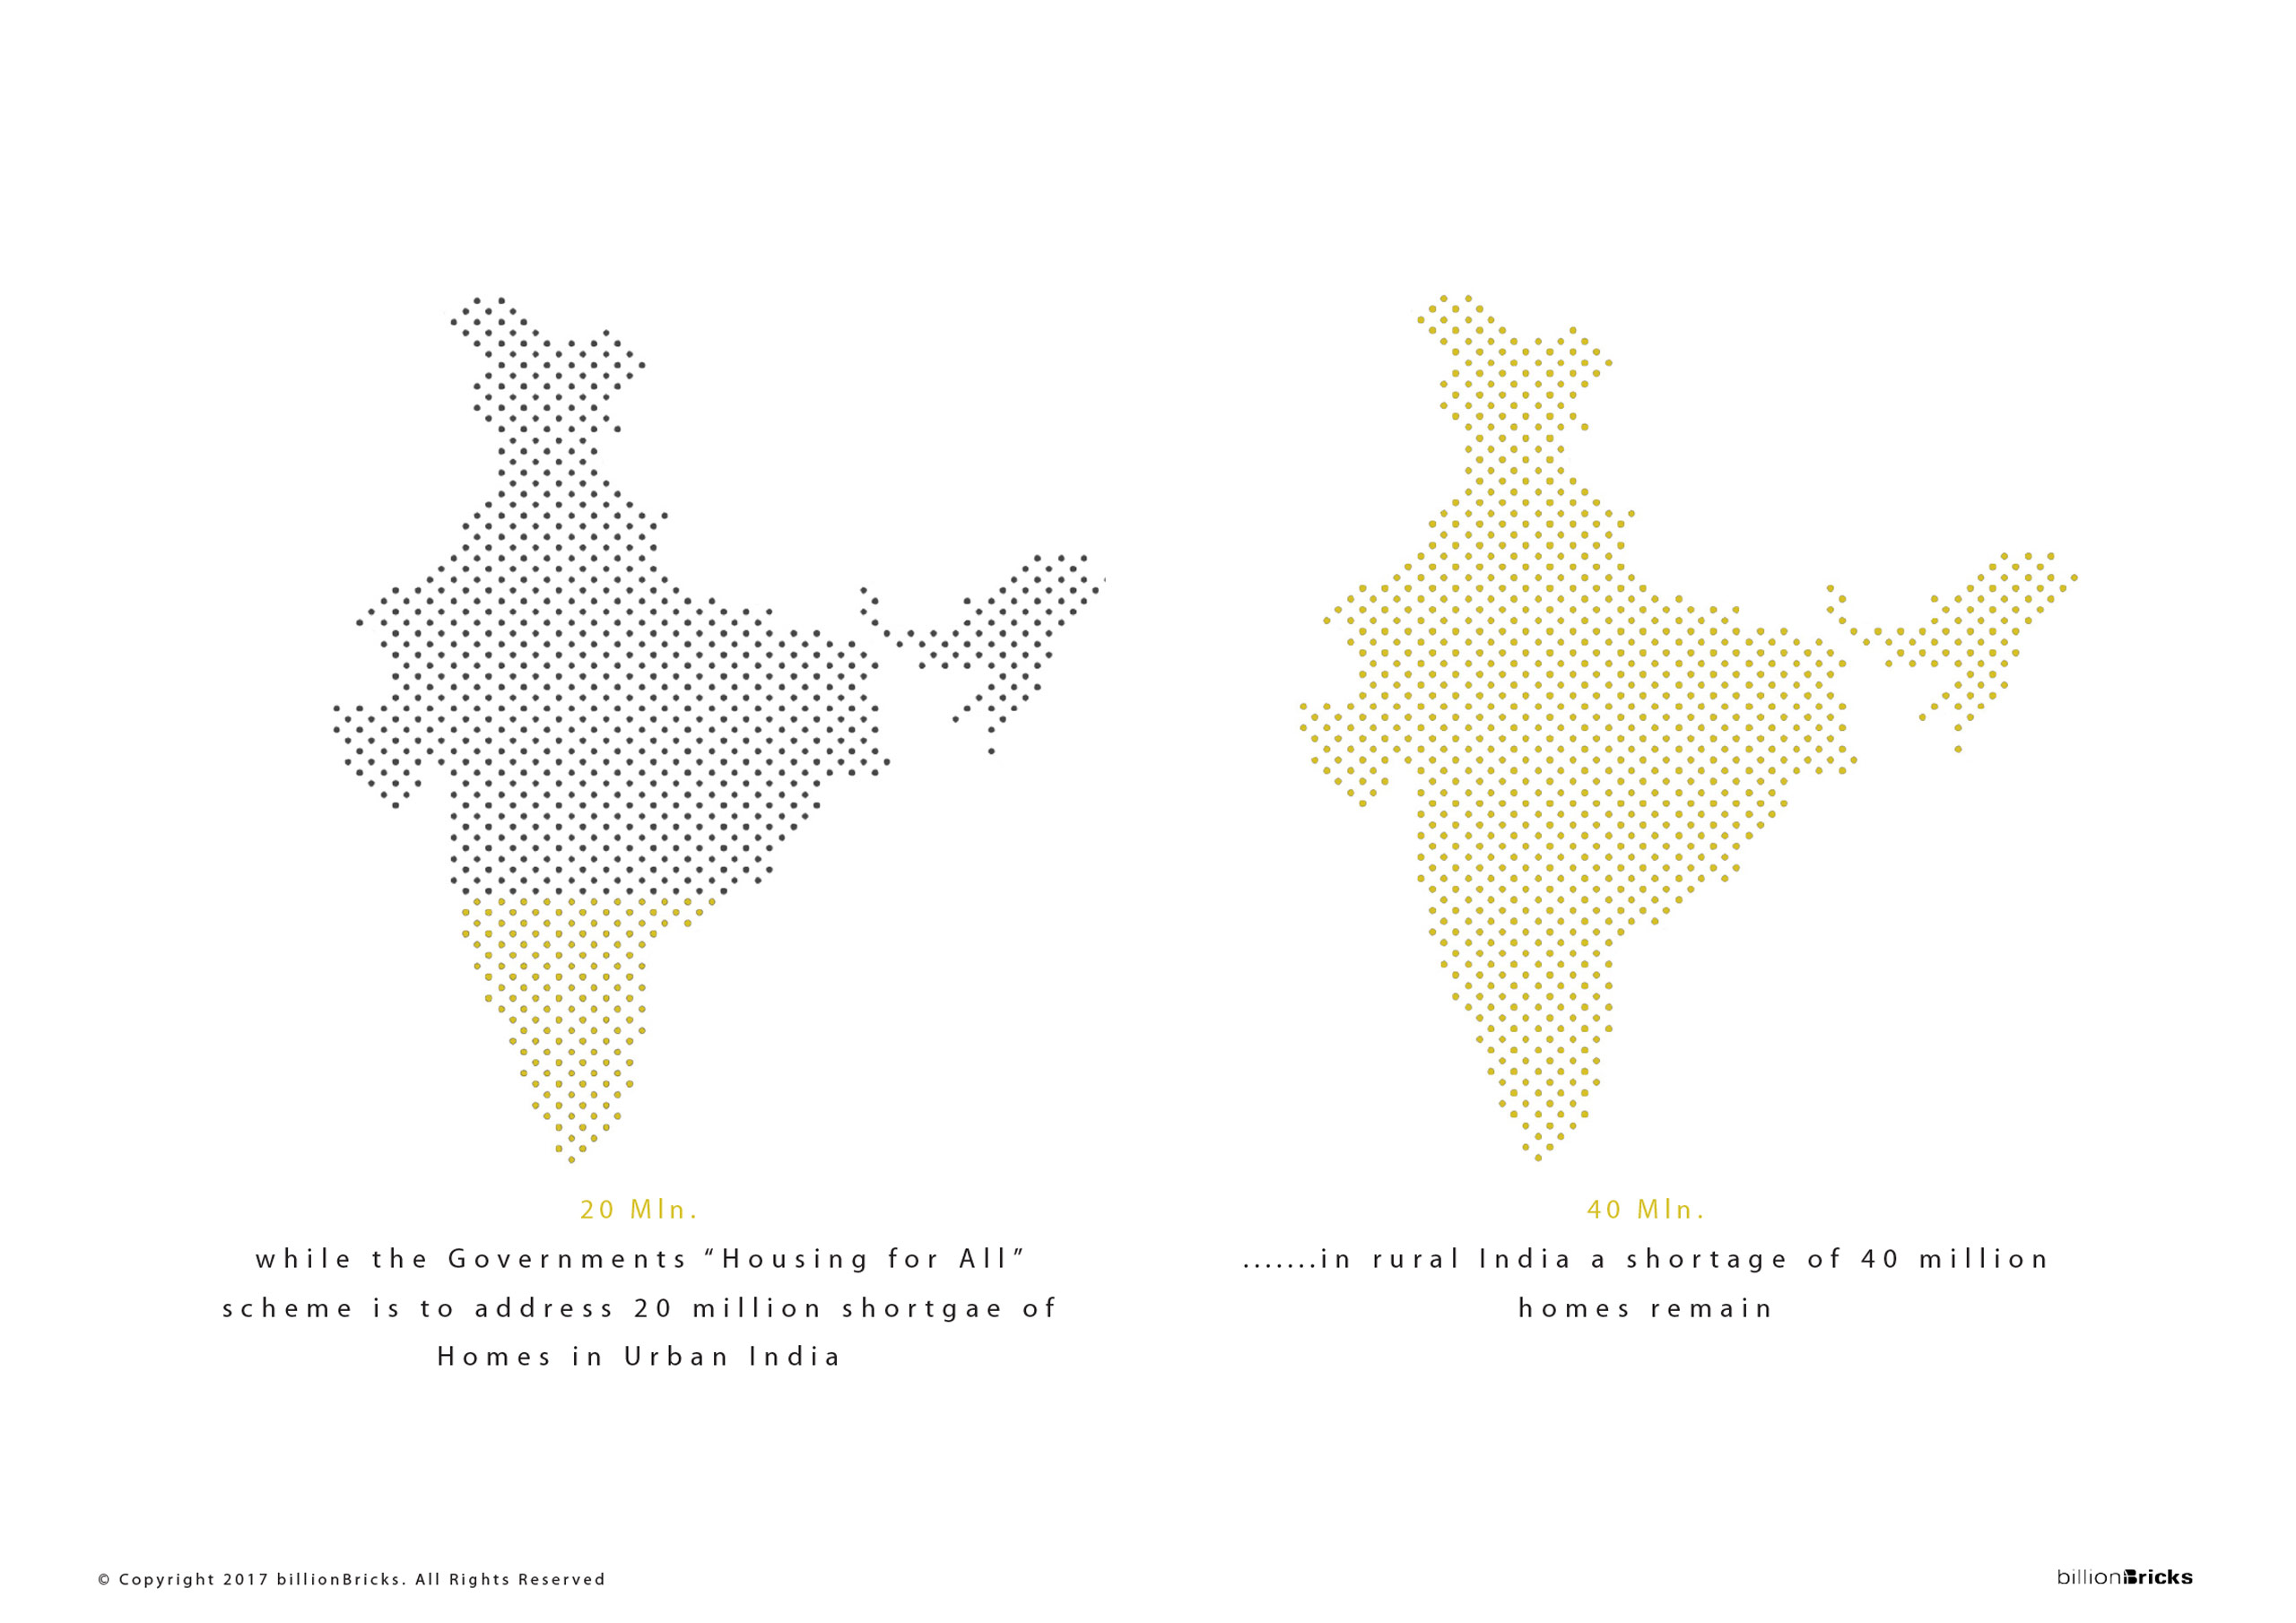 shortage of 40 million rural homes